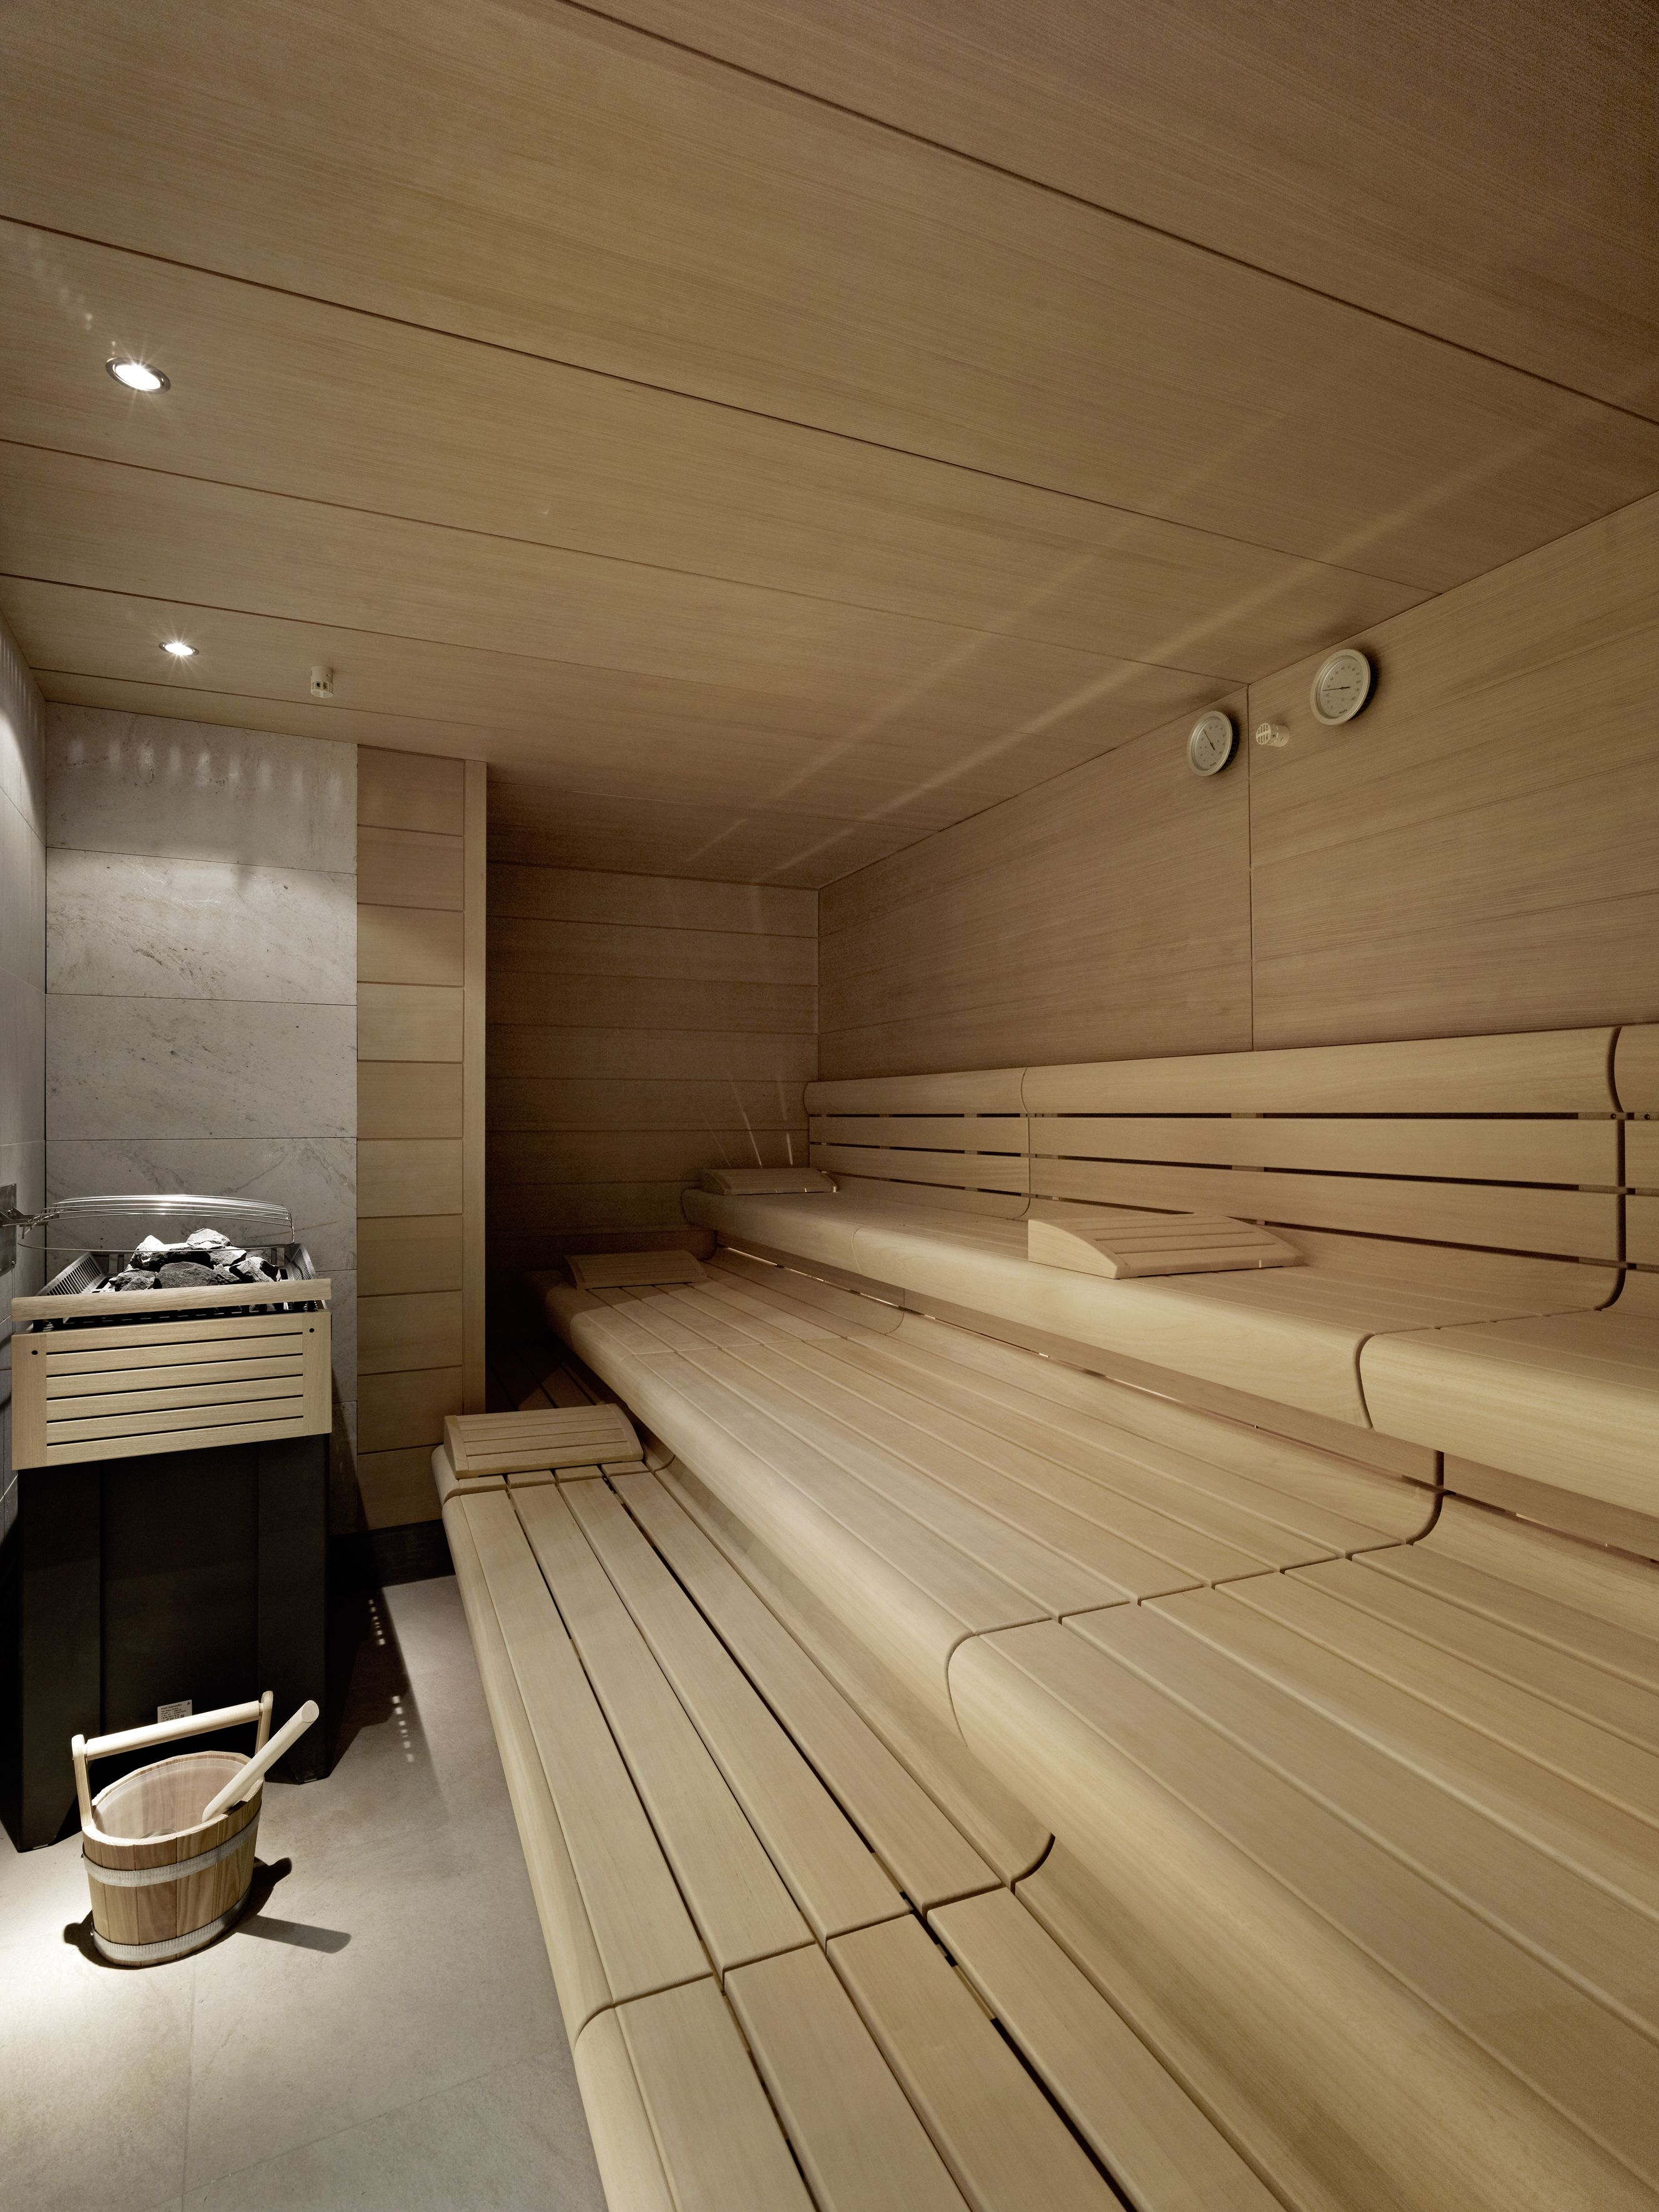 Sauna credit gregor titze sans souci spa pinterest - Oasis bano turco sl ...